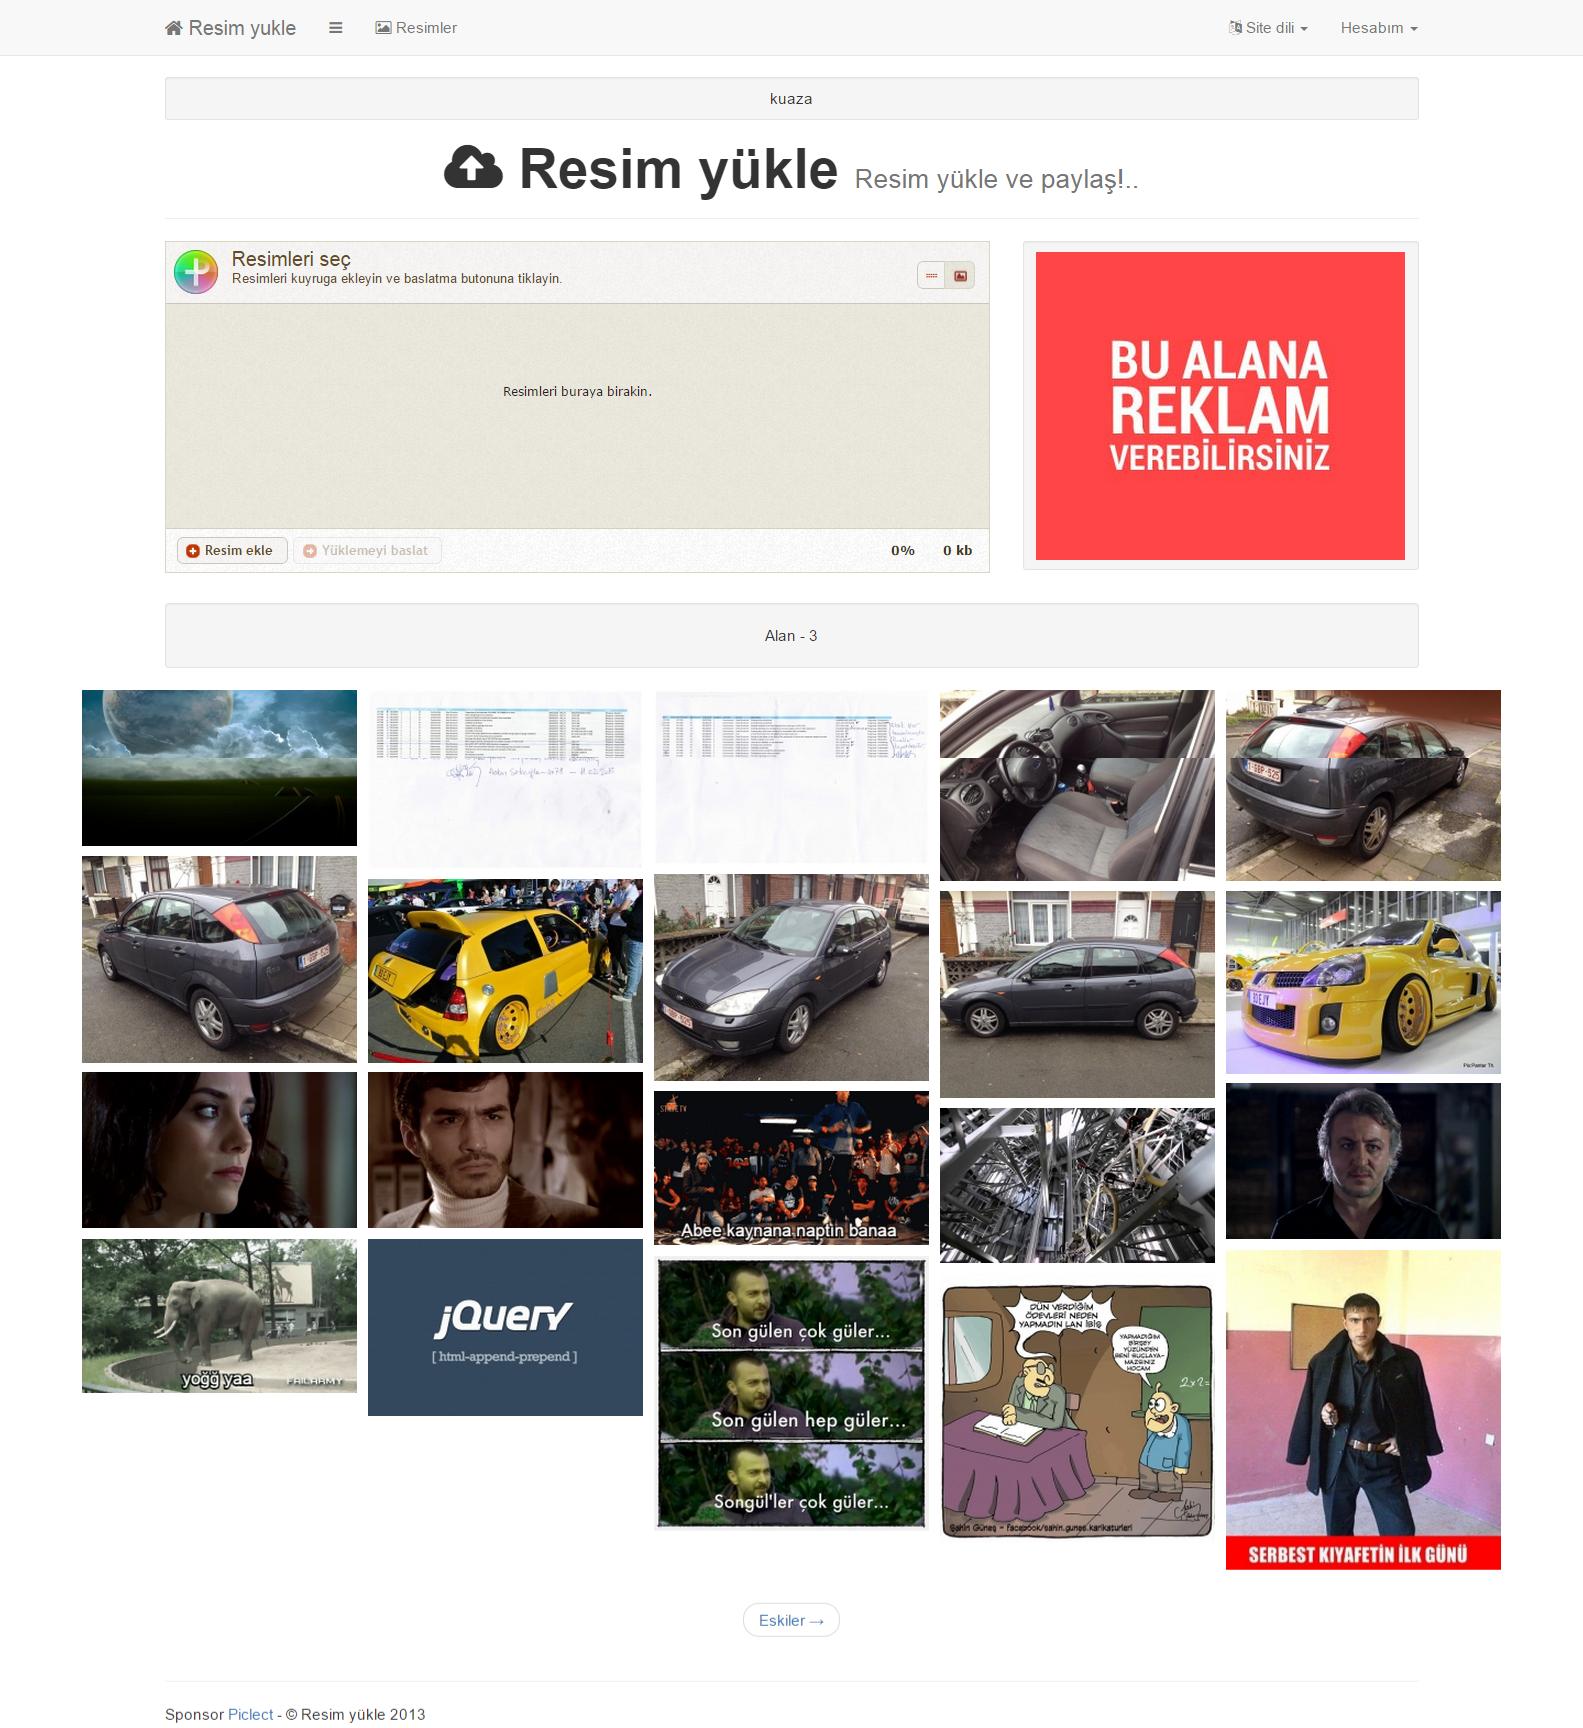 ressim.net - Resim Yükle - index 1